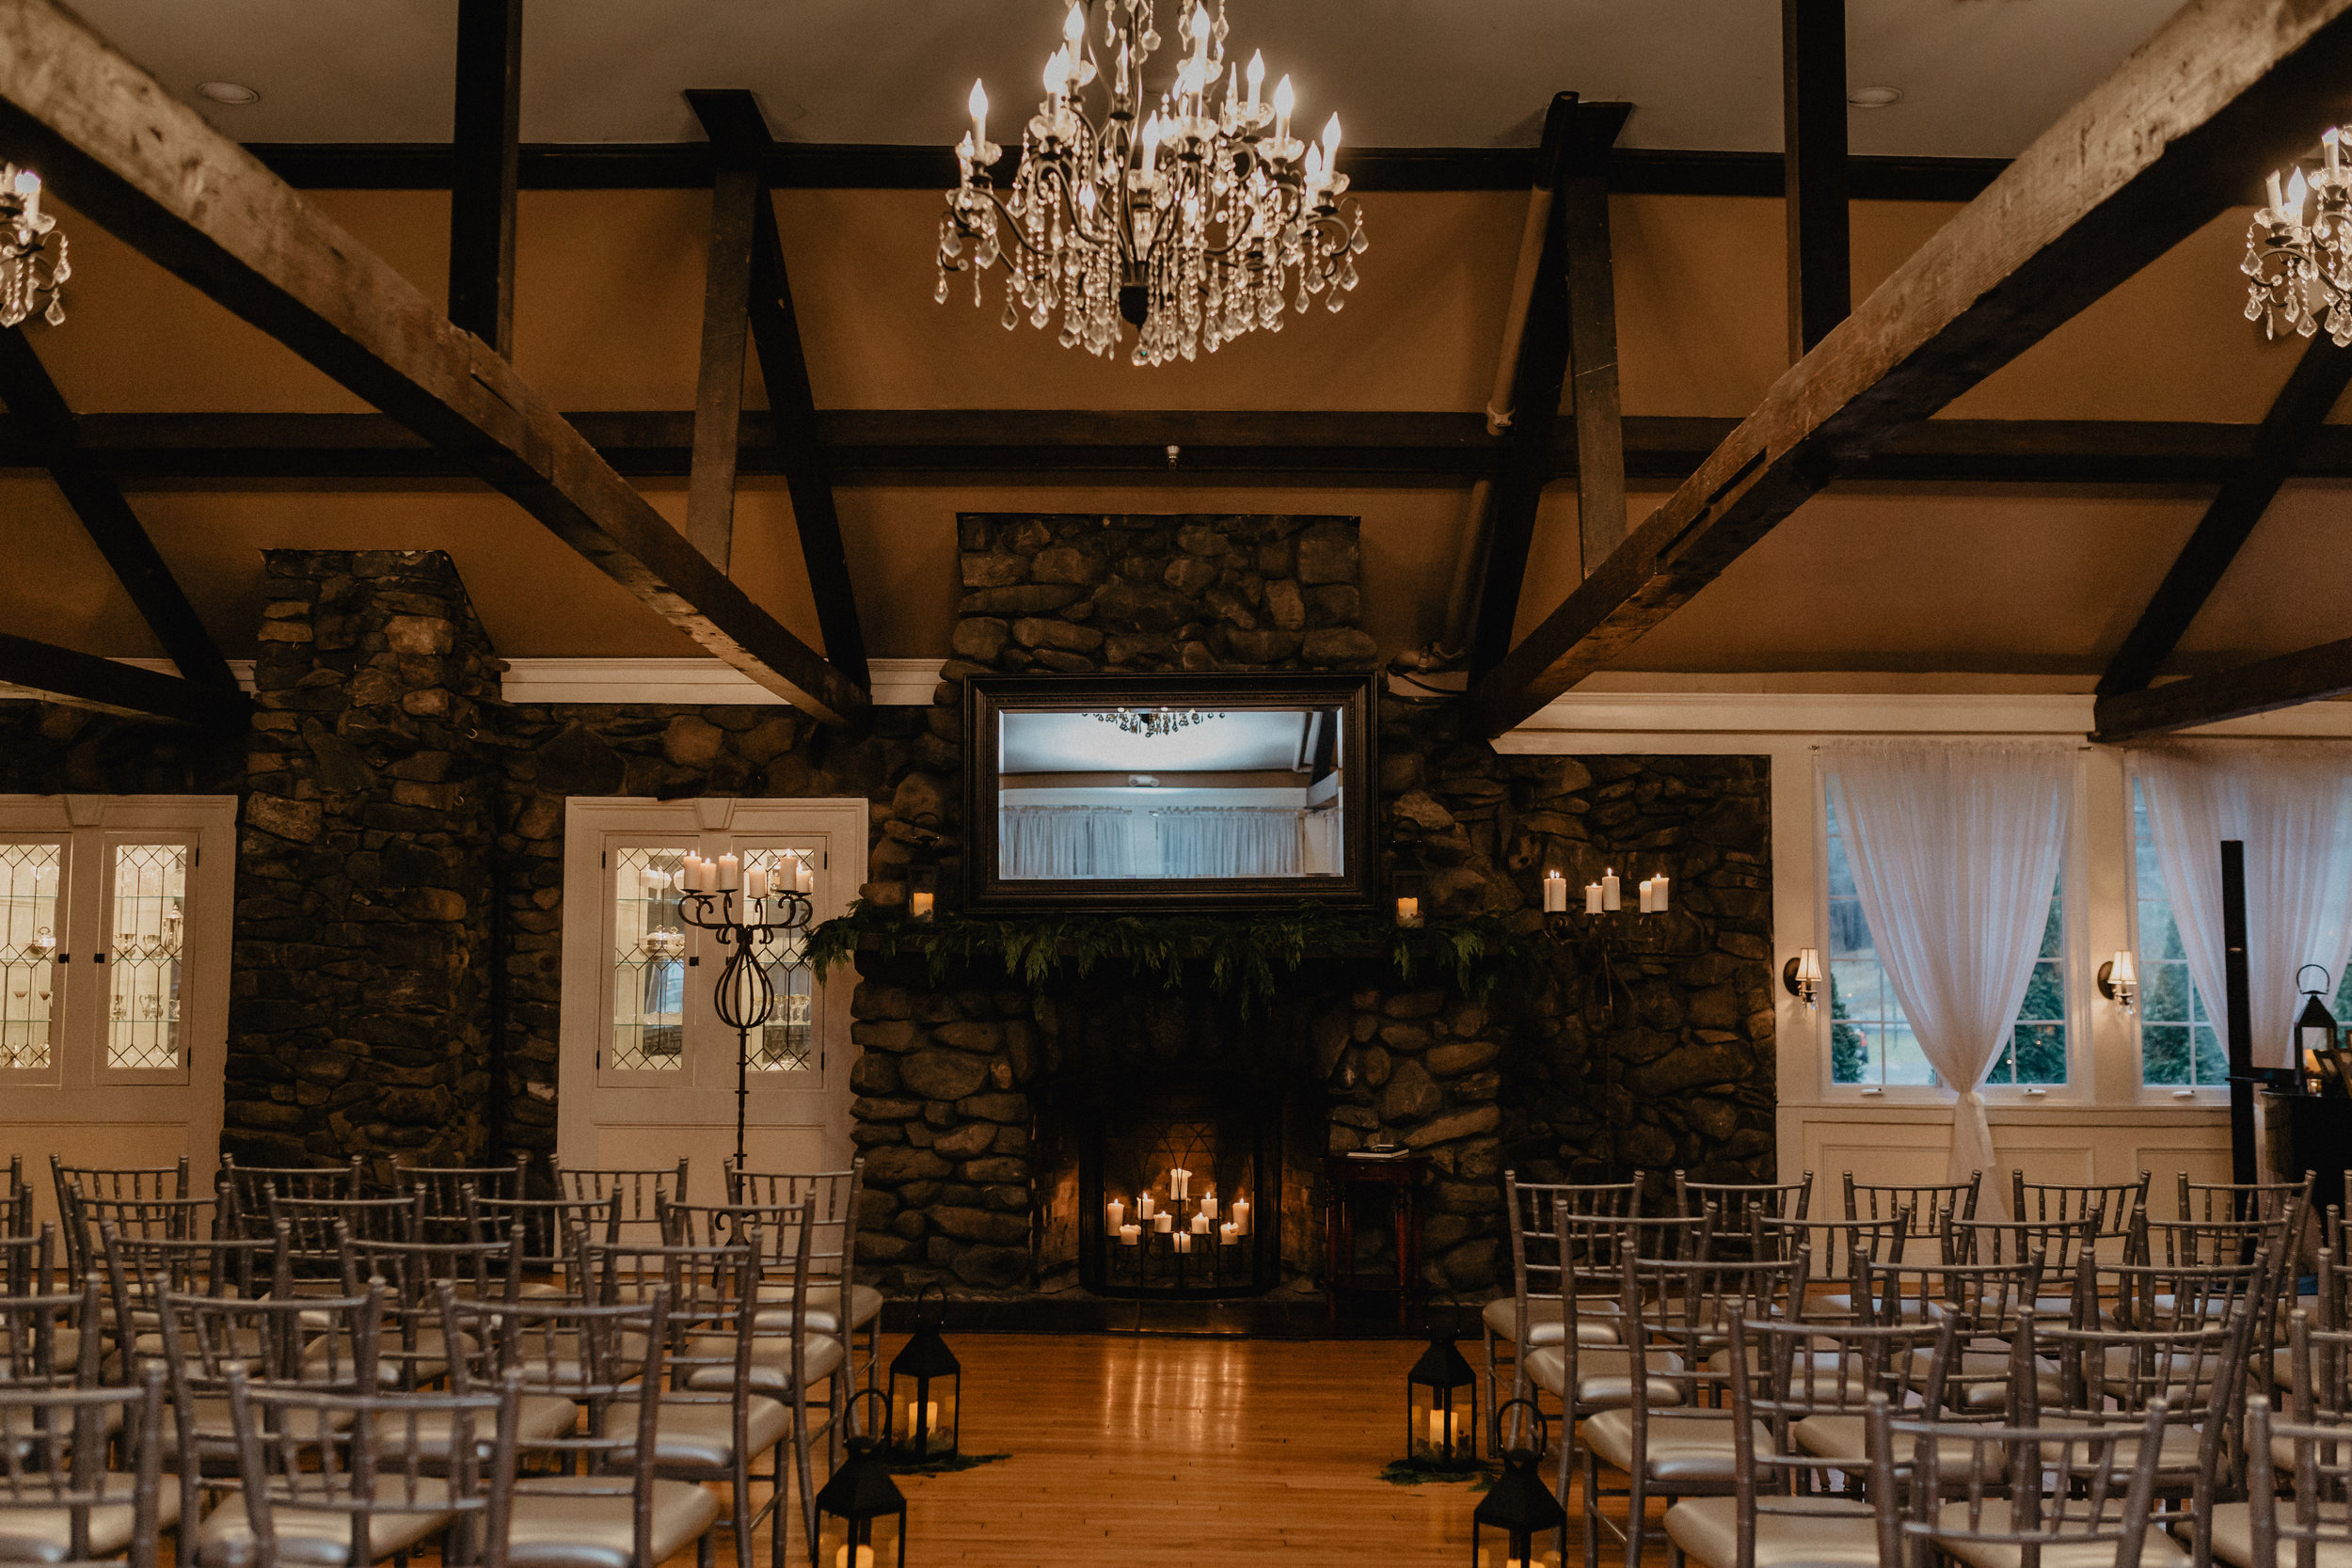 old_daley_on_crooked_lake_wedding_043.jpg